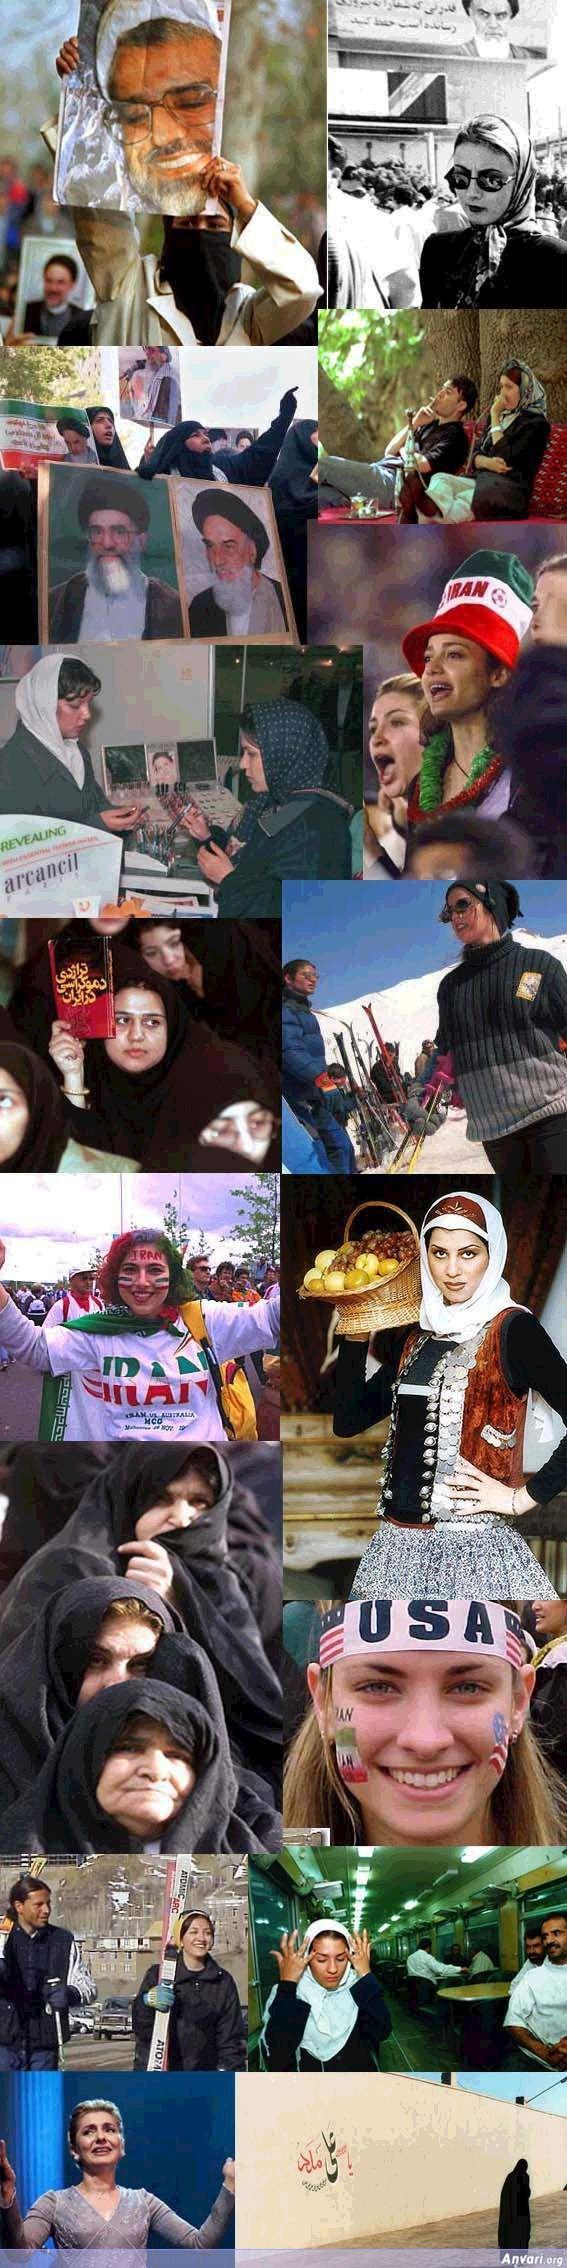 Farsi iranian women farsi thecheapjerseys Images